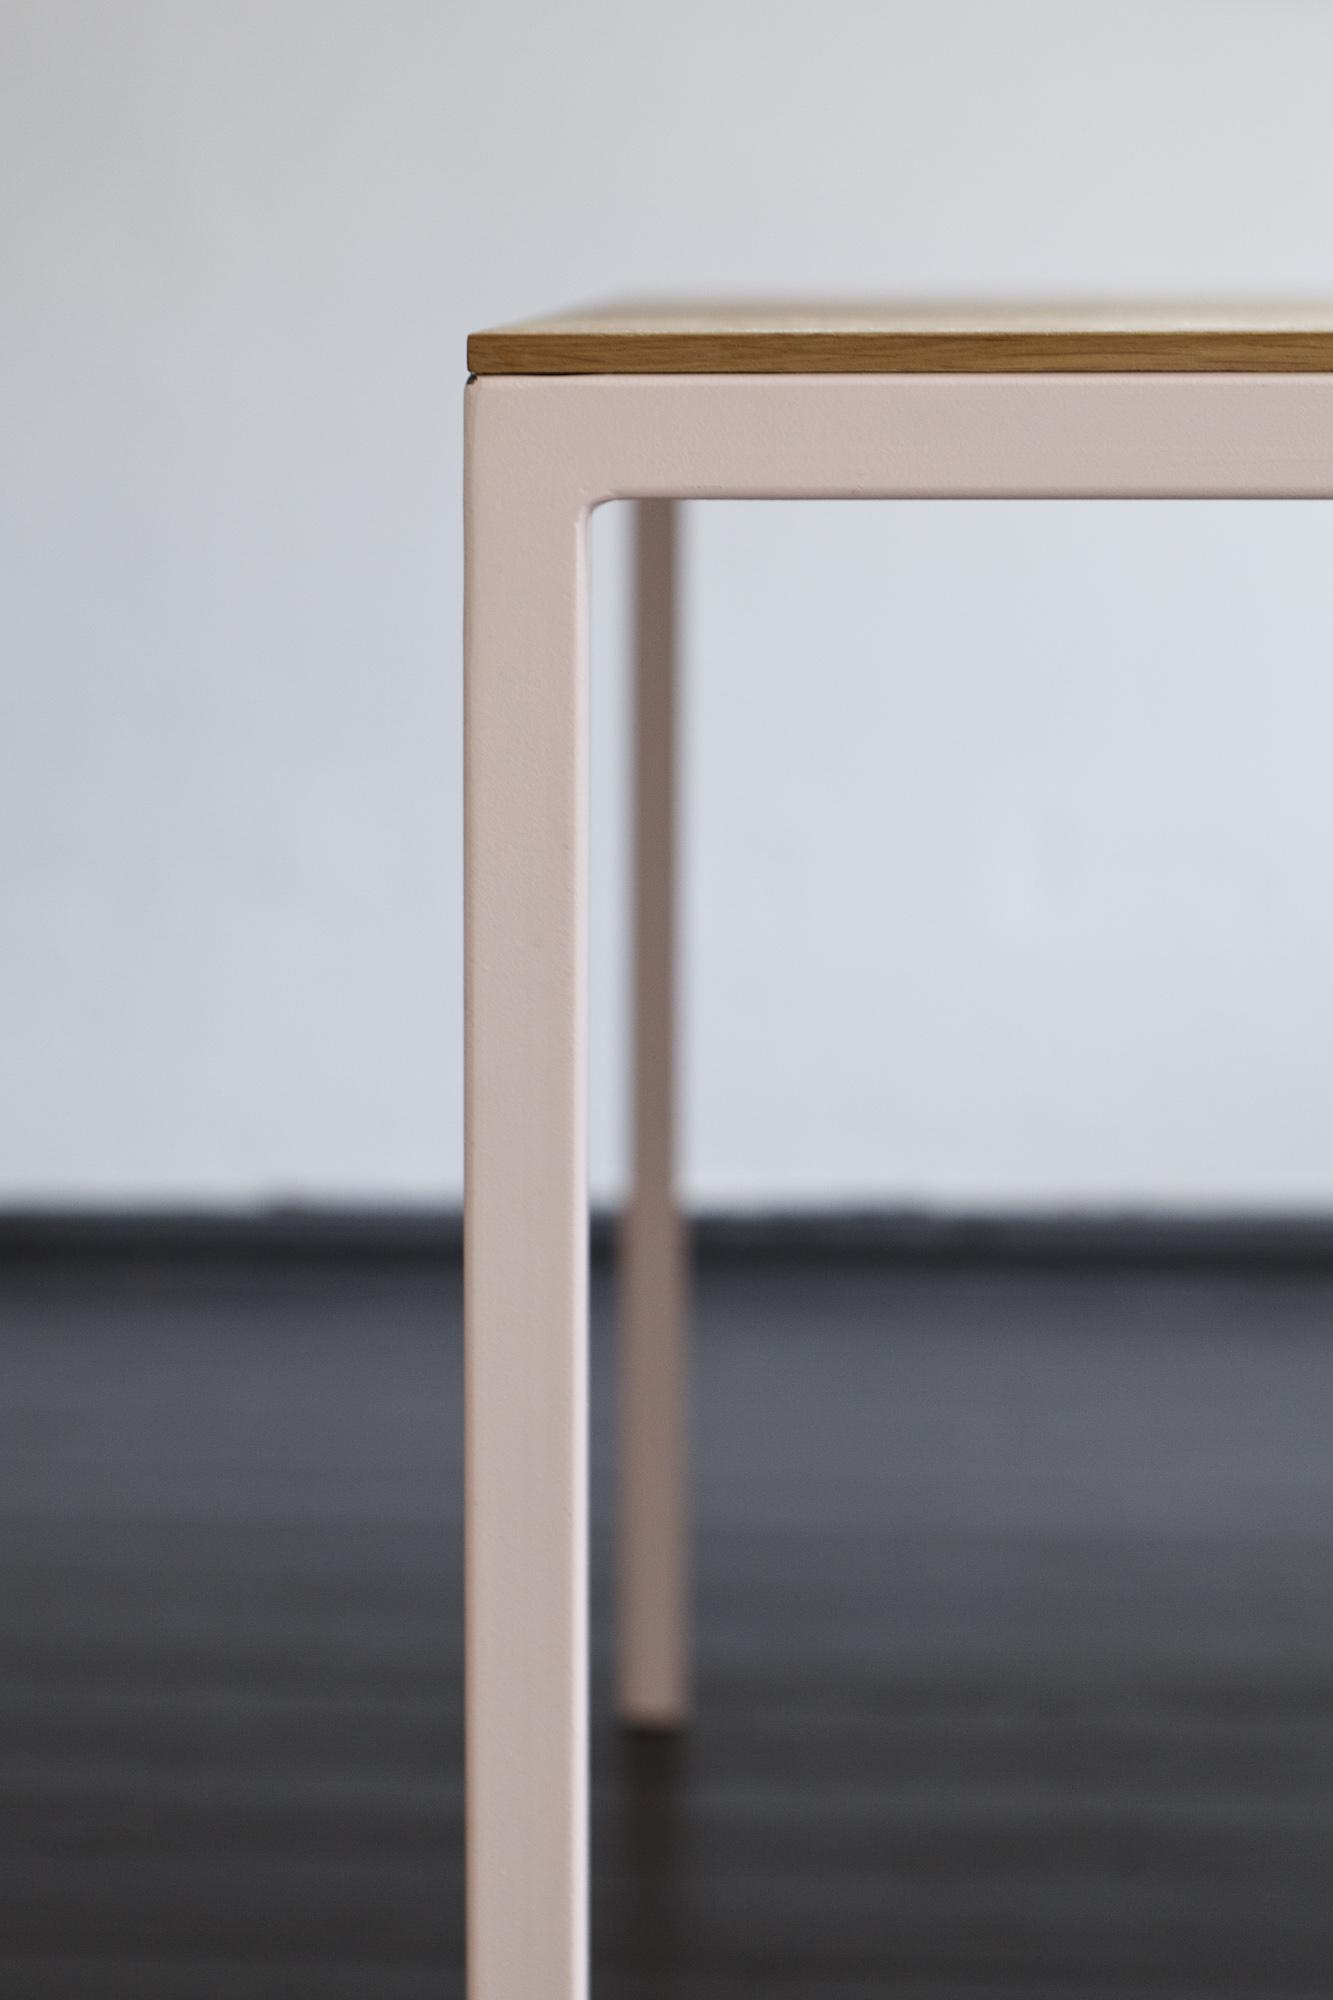 table-tib-so-hme-6236.jpg